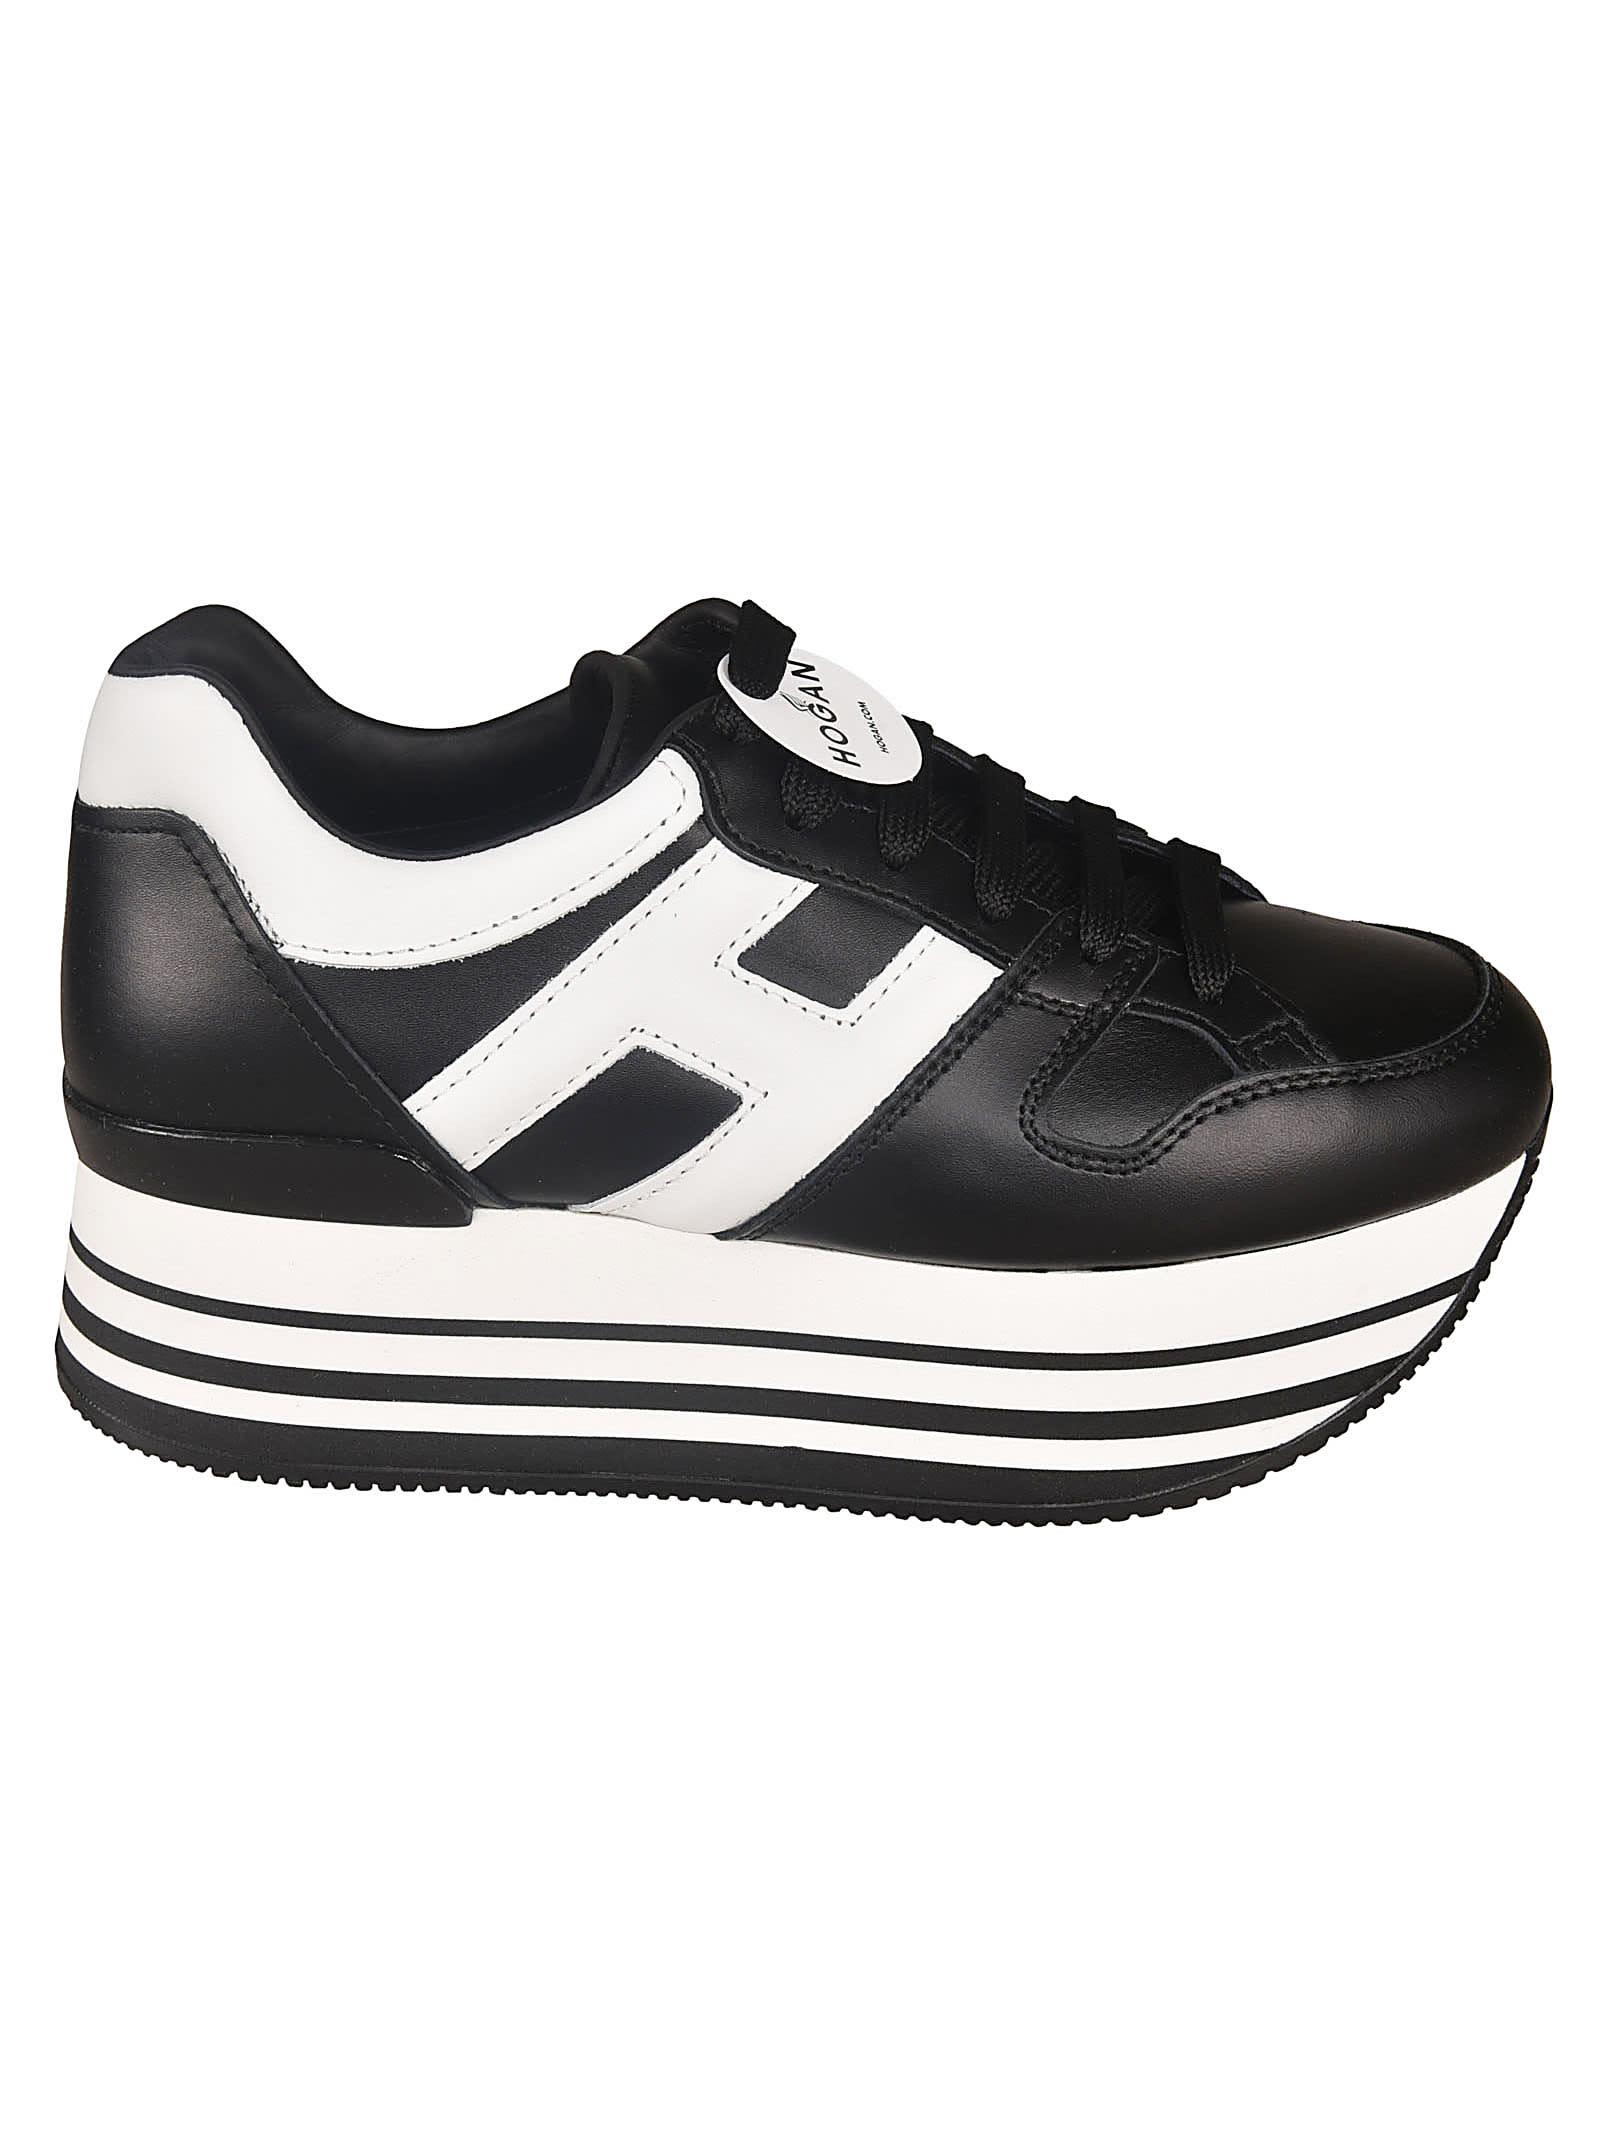 Hogan H233 Maxi 222 Sneakers In Black/white | ModeSens